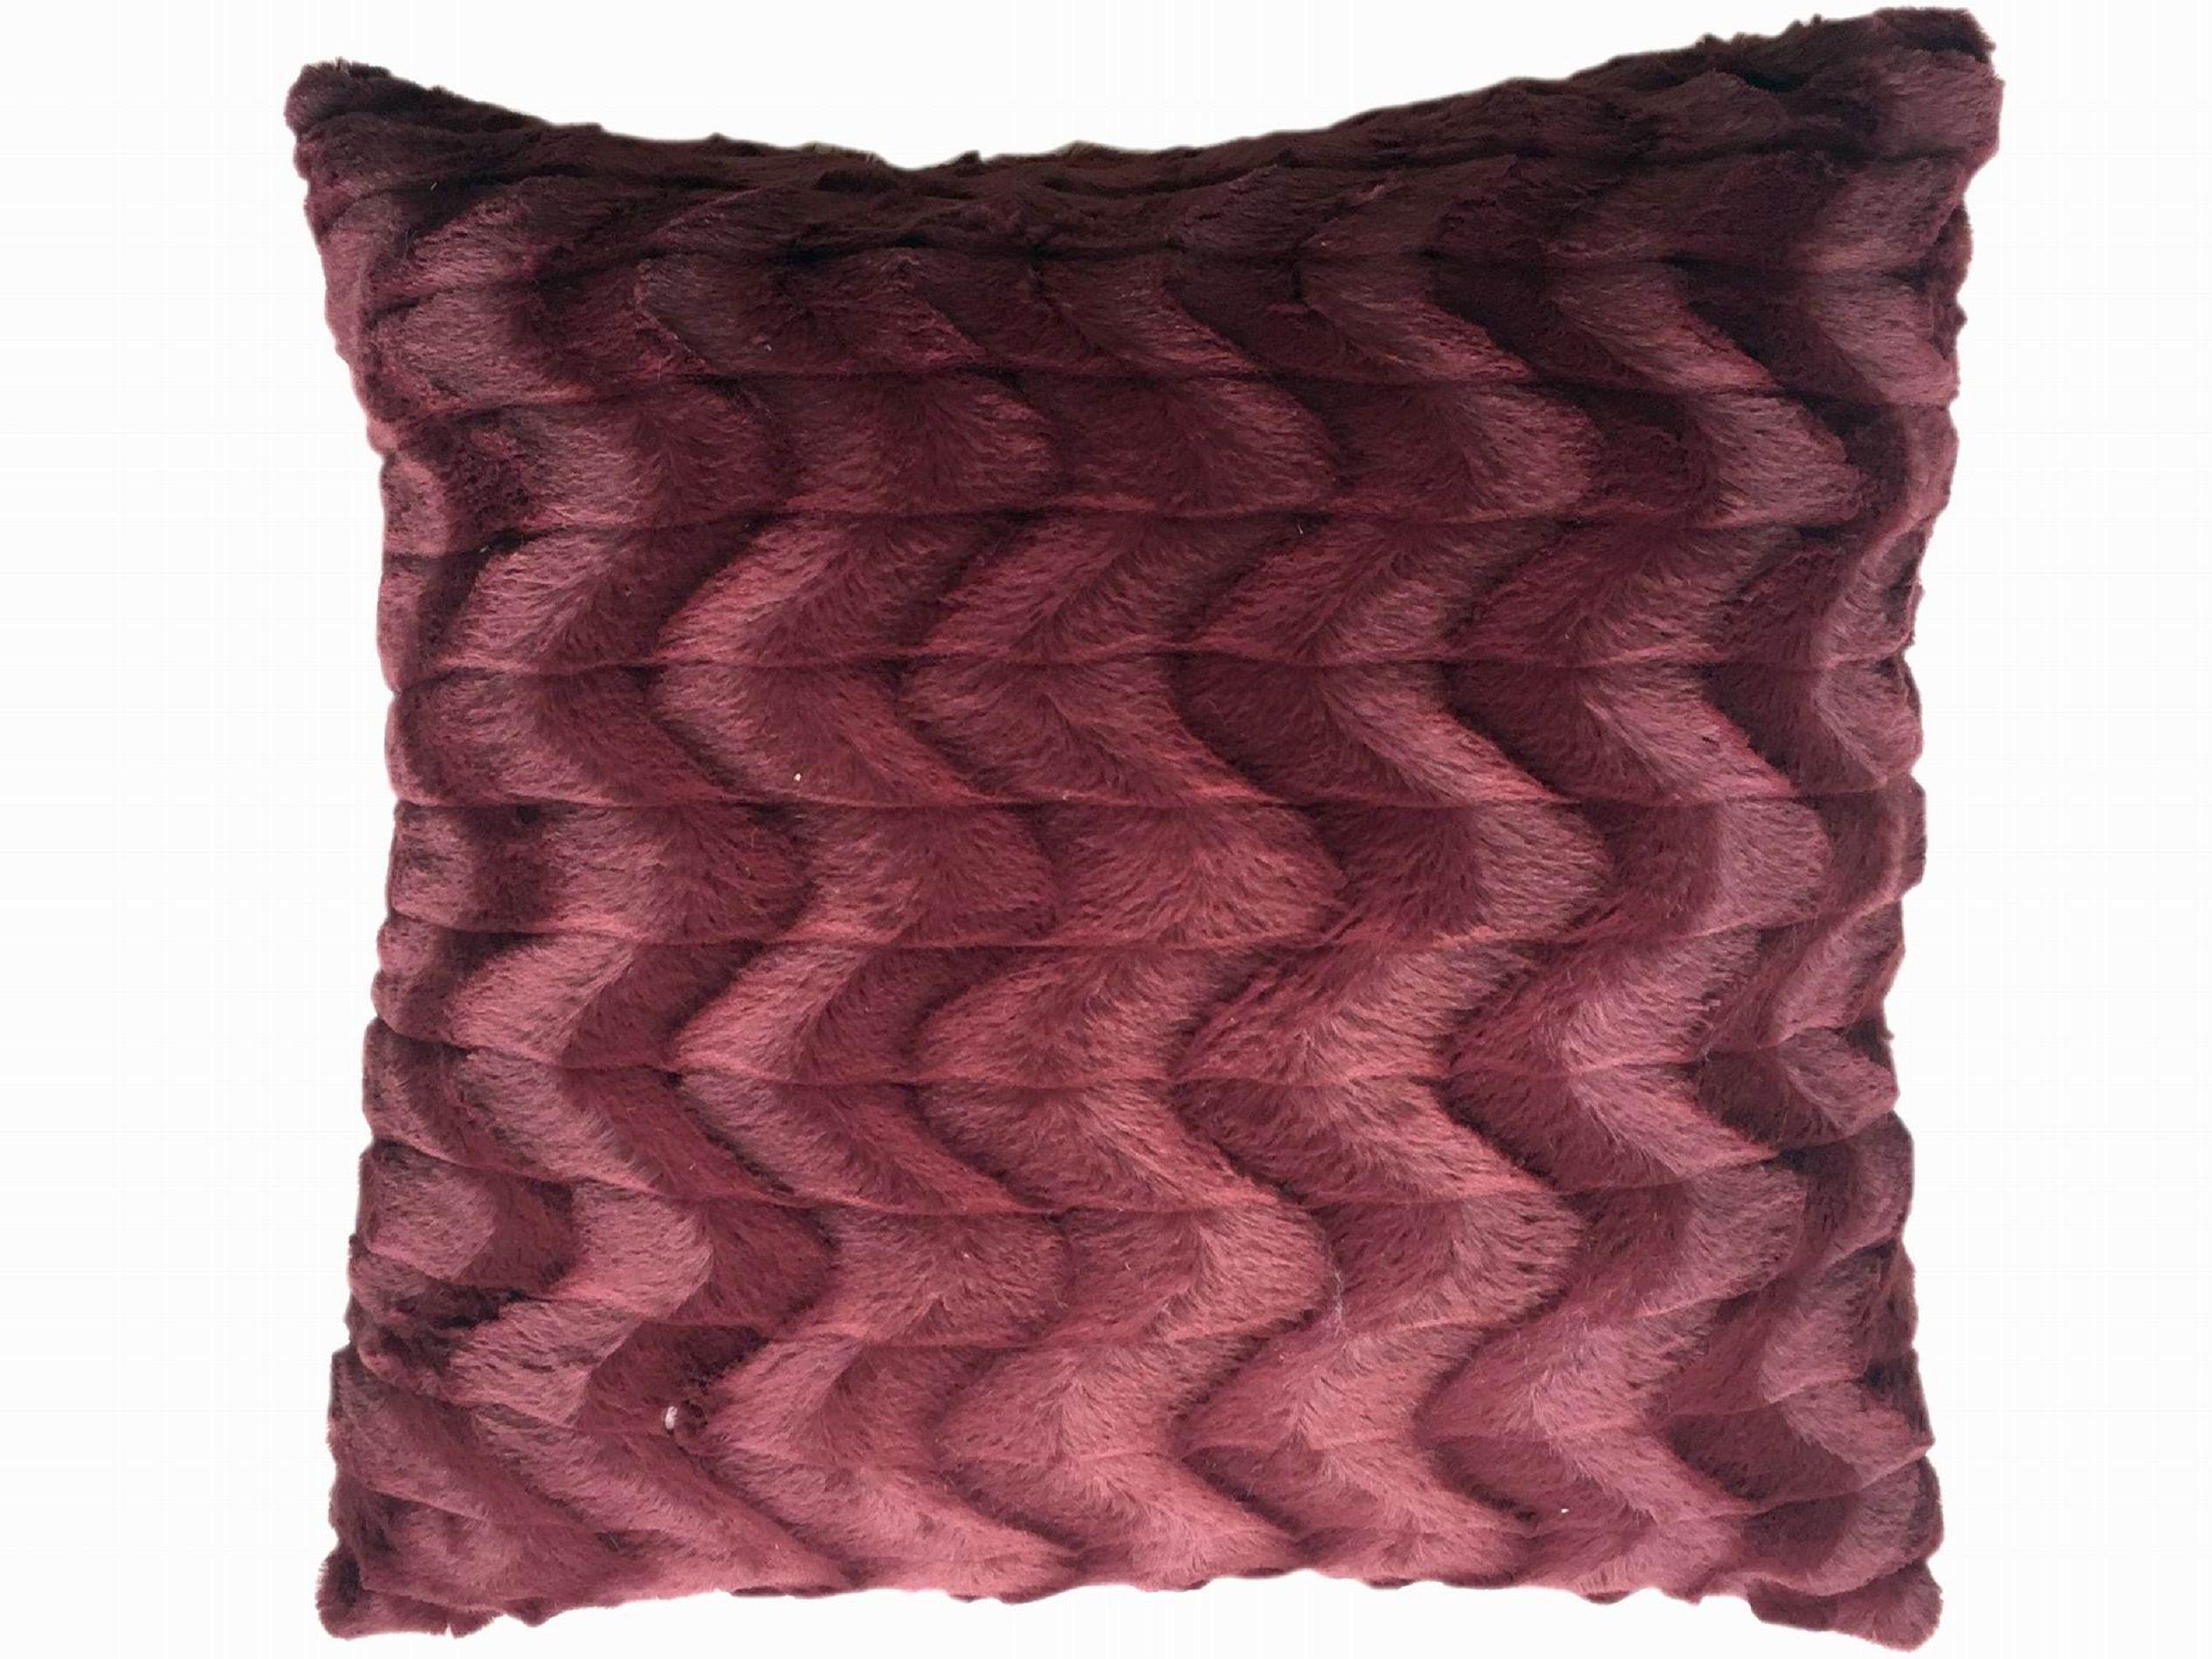 Cannon 20†x 20†Fur Decorative Pillow - Burgandy, Red ...